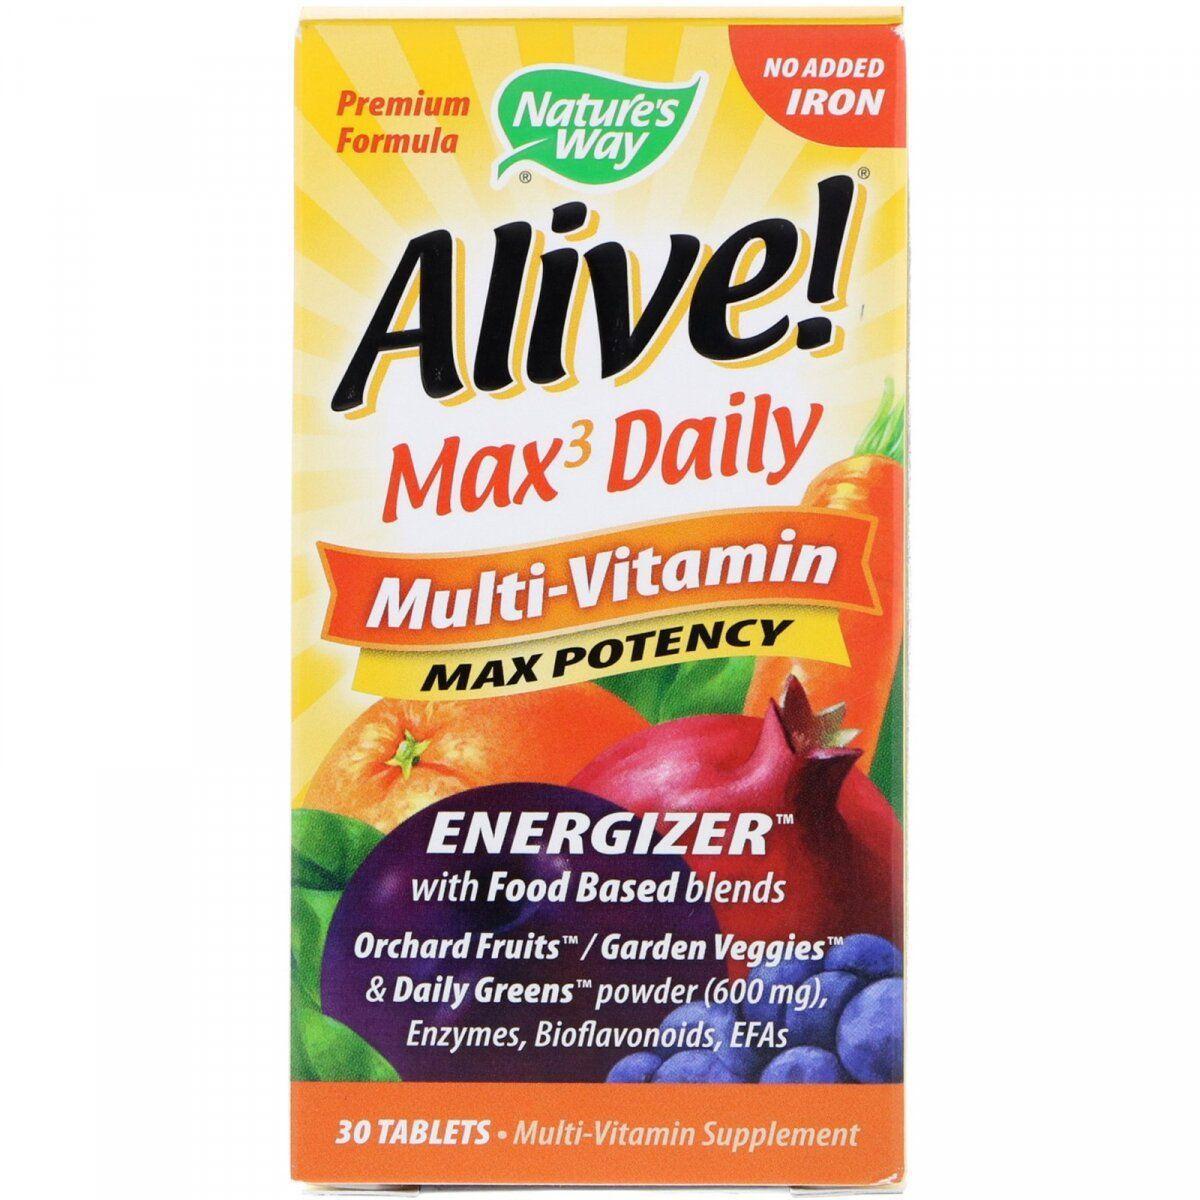 Nature's Way Alive! Max 3 Daily Multi-Vitamin, Мультивитаминный комплекс (30 таб.)